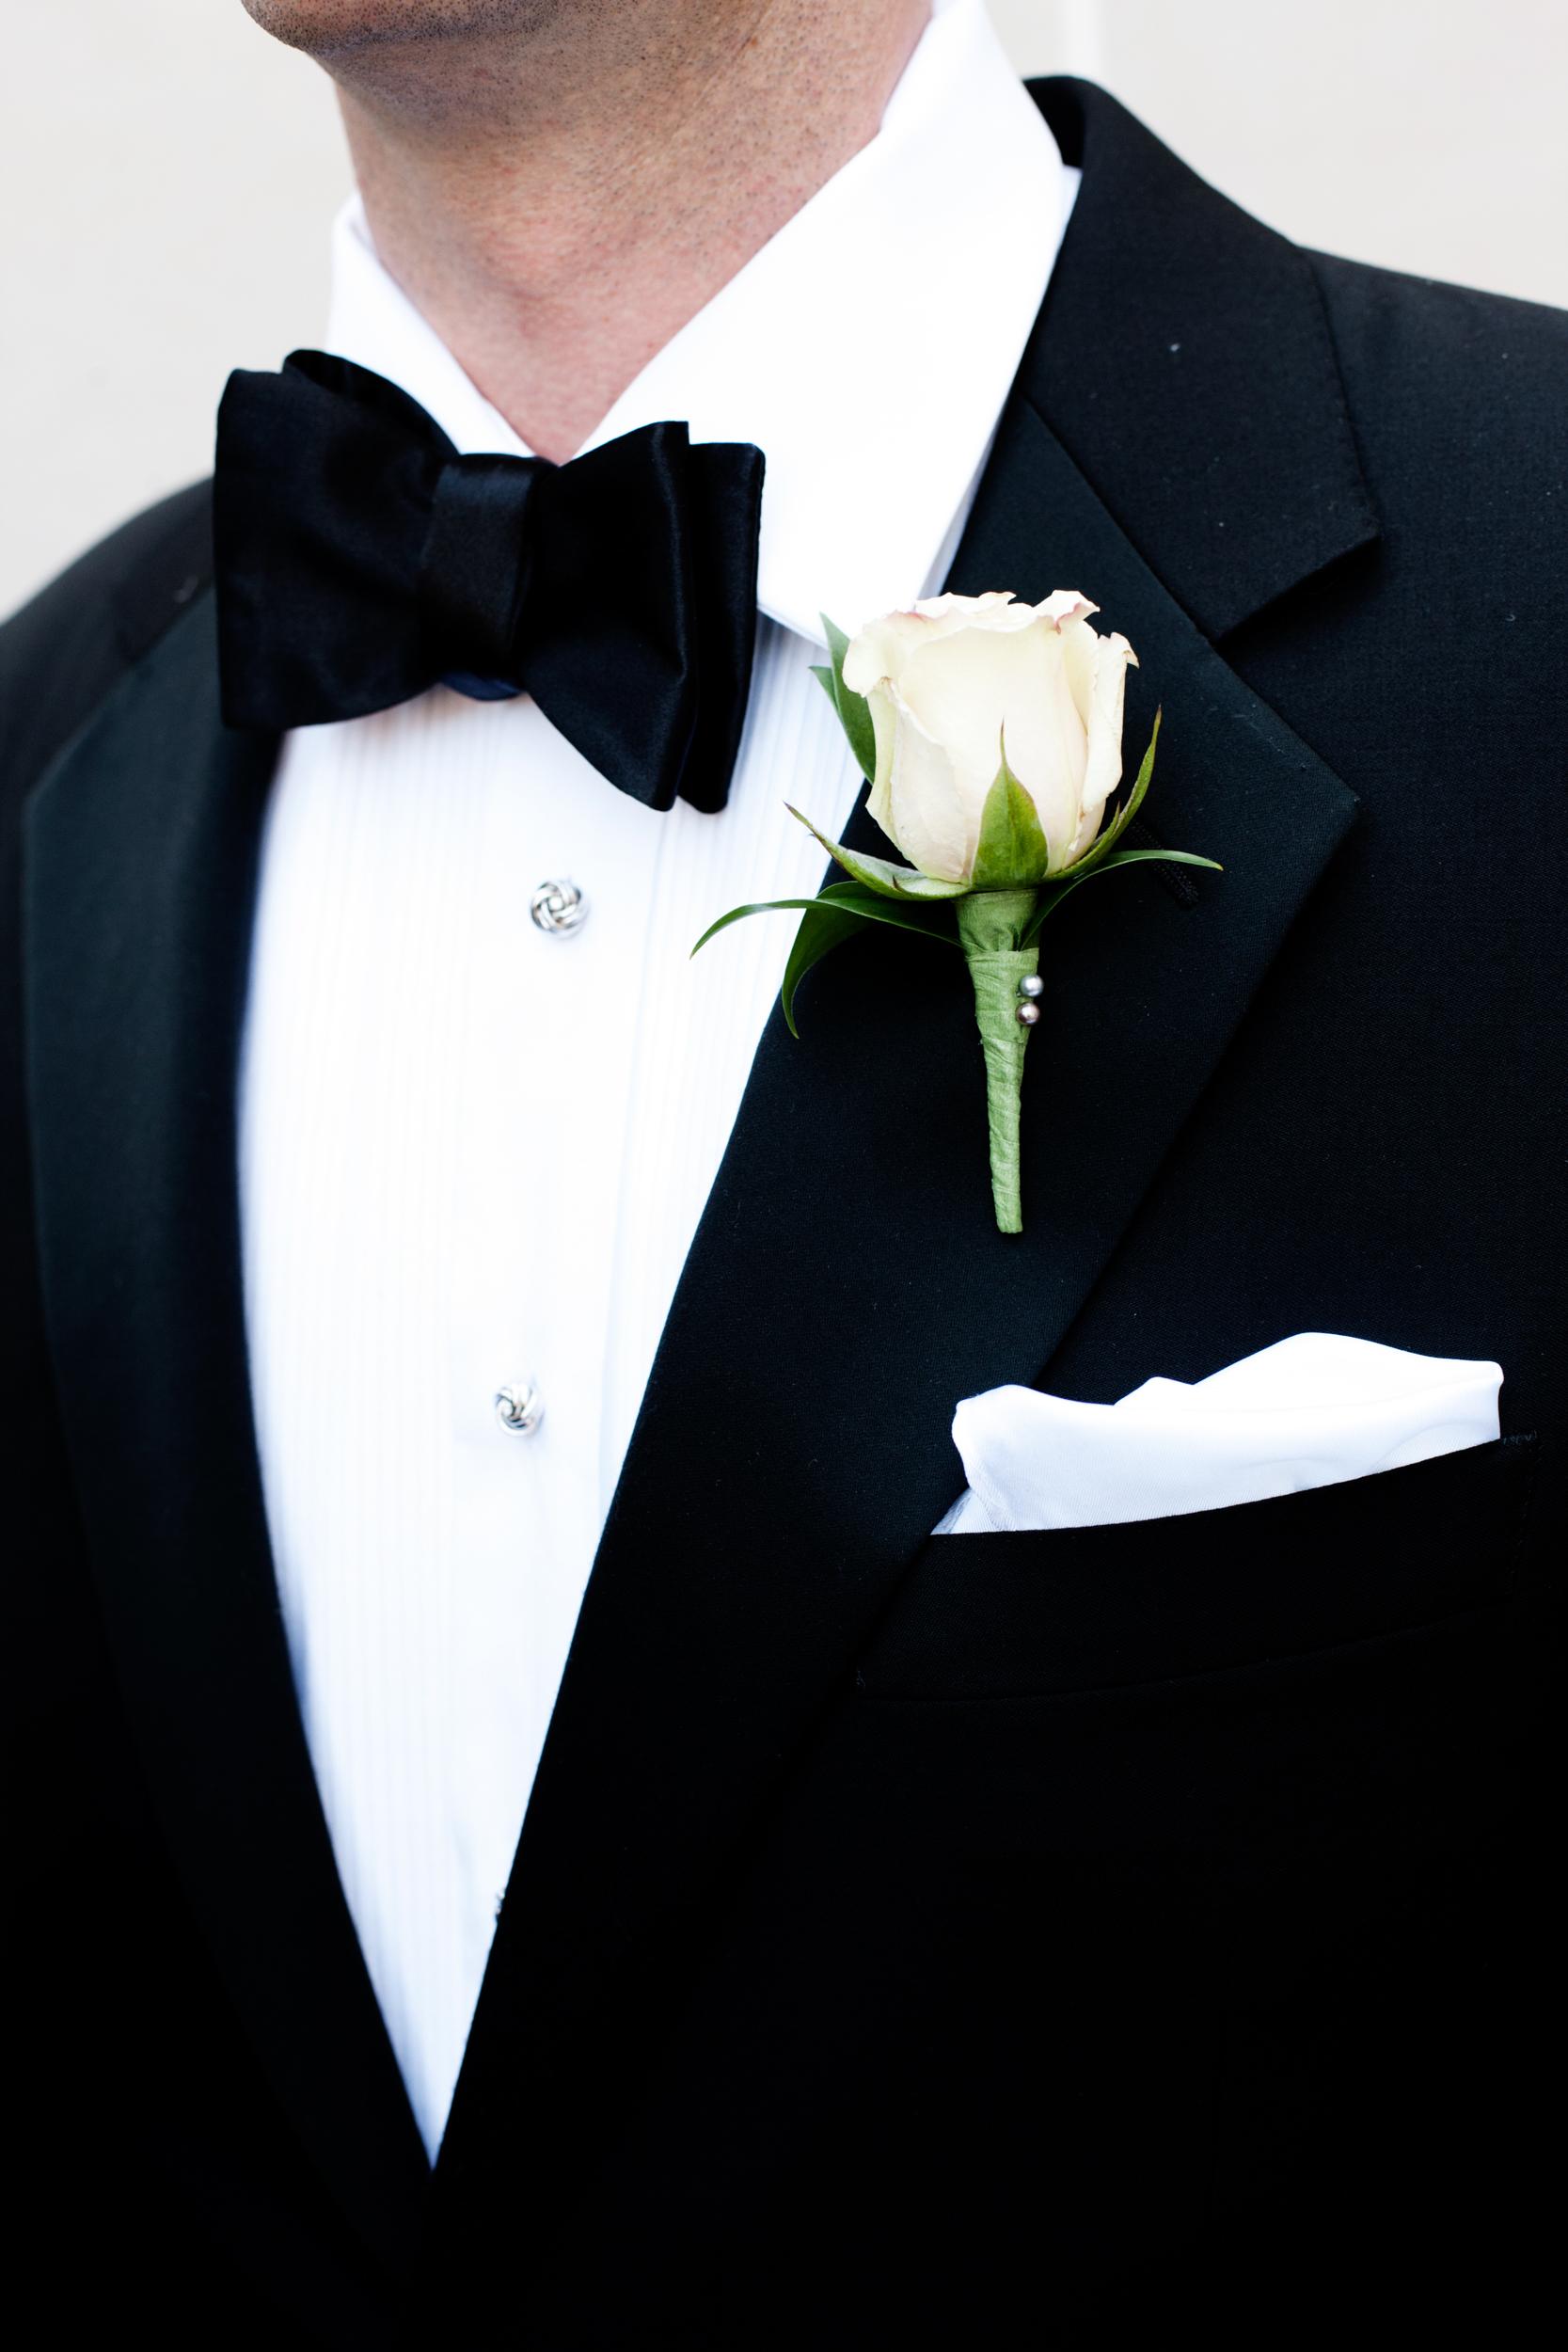 Ceci_New_York_Ceci_Style_Ceci_Johnson_Luxury_Lifestyle_Floral_Lace_Wedding_Letterpress_Inspiration_Design_Custom_Couture_Personalized_Invitations_-72.jpg